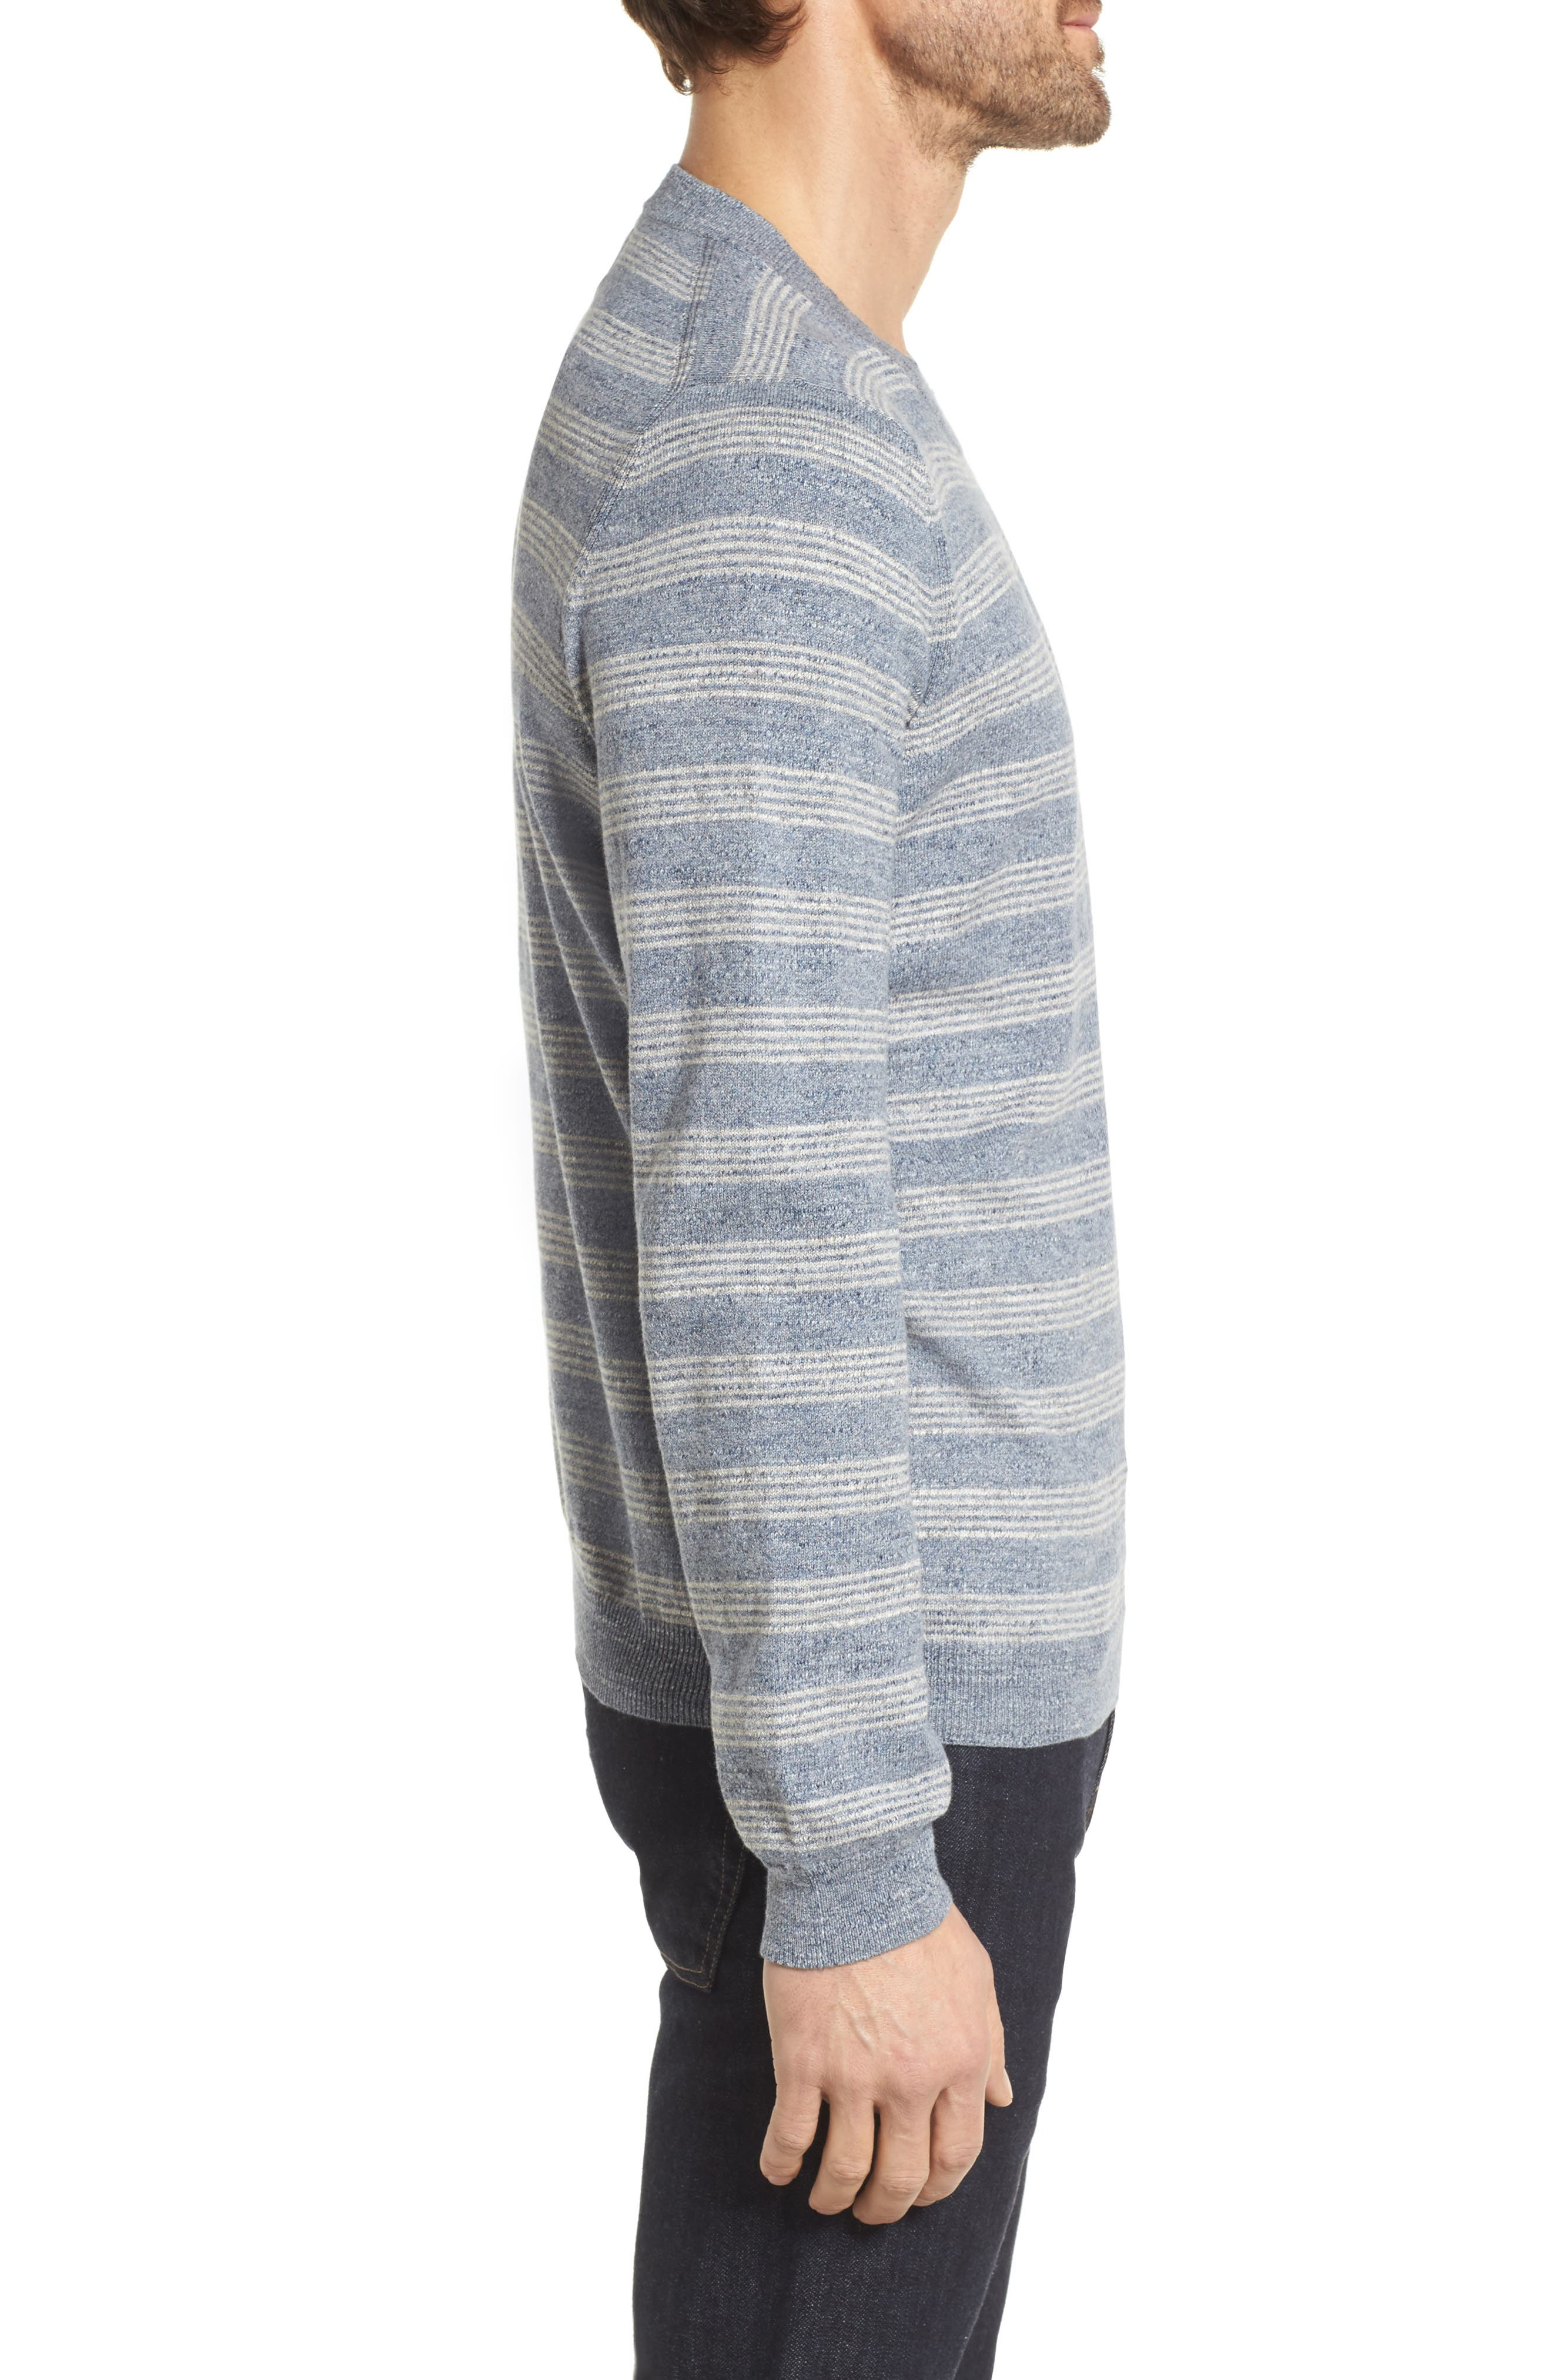 Stripe Cotton Sweater,                             Alternate thumbnail 3, color,                             Blue Grey Heather Stripe